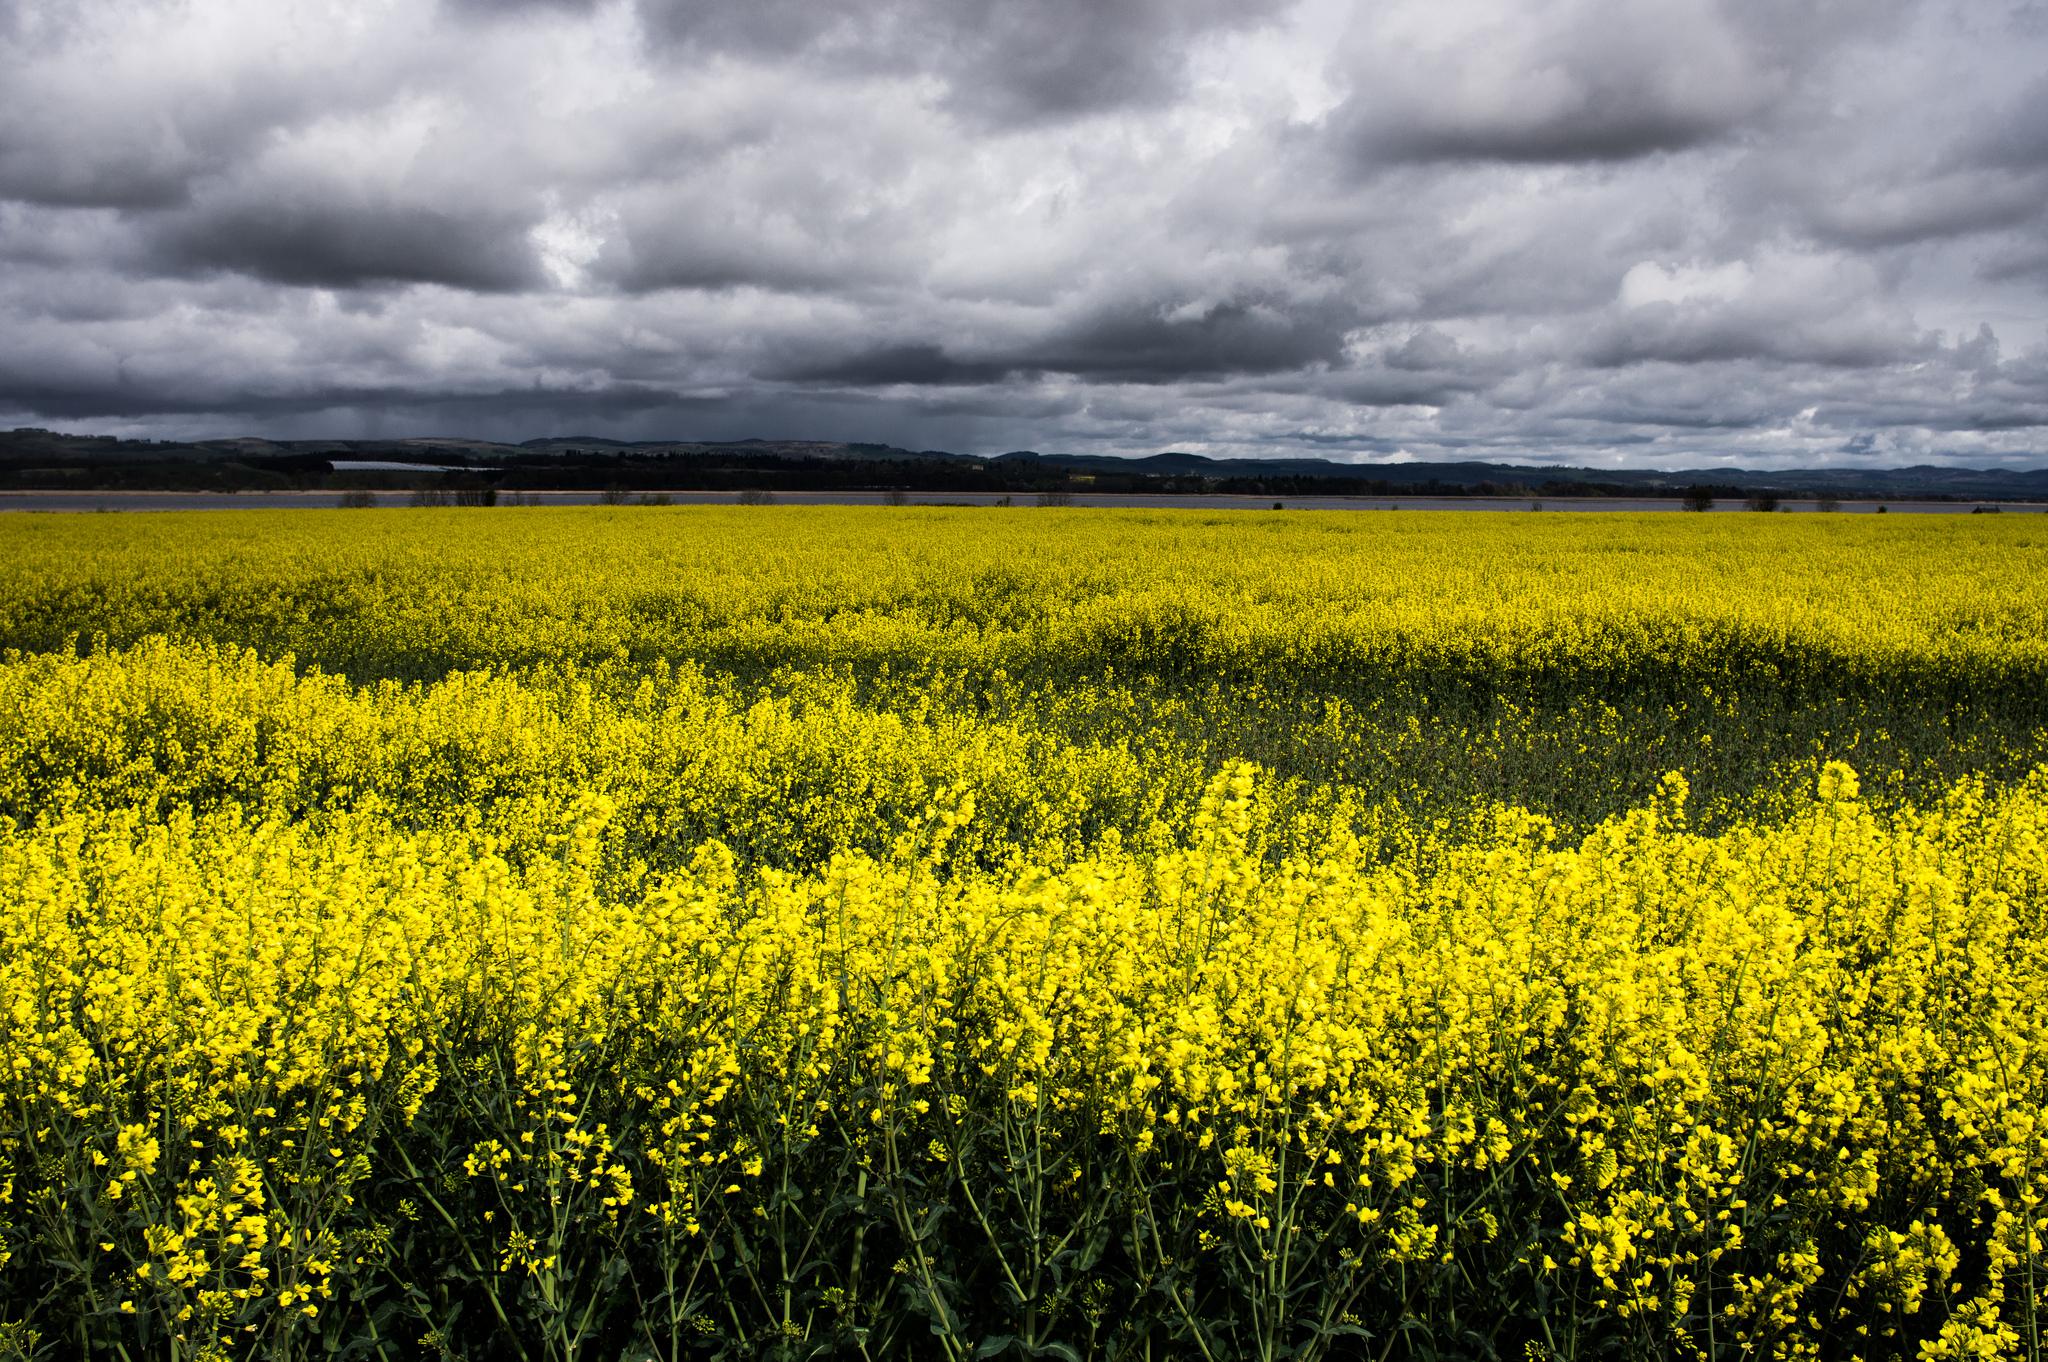 Canola Blooms In Idaho A Bucket List Worthy Day Trip